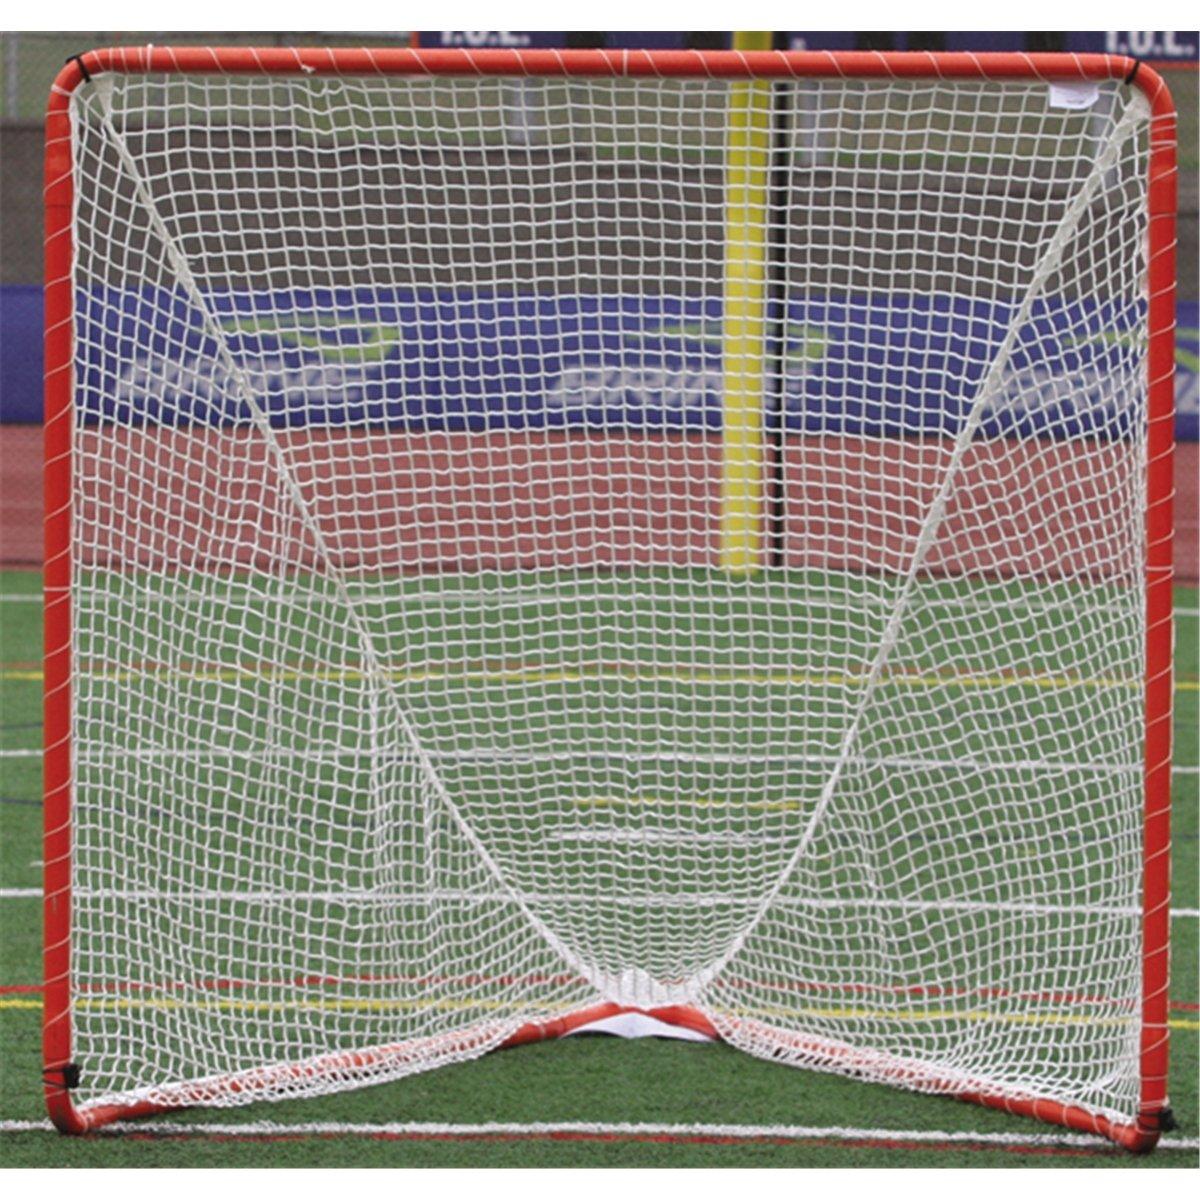 Amazon.com: Brine High School Lacrosse Goal, 1.75 Inch Frame 8 Piece 300Lpn  Net Included (6 X 6 X 7 Feet, Orange): Sports U0026 Outdoors